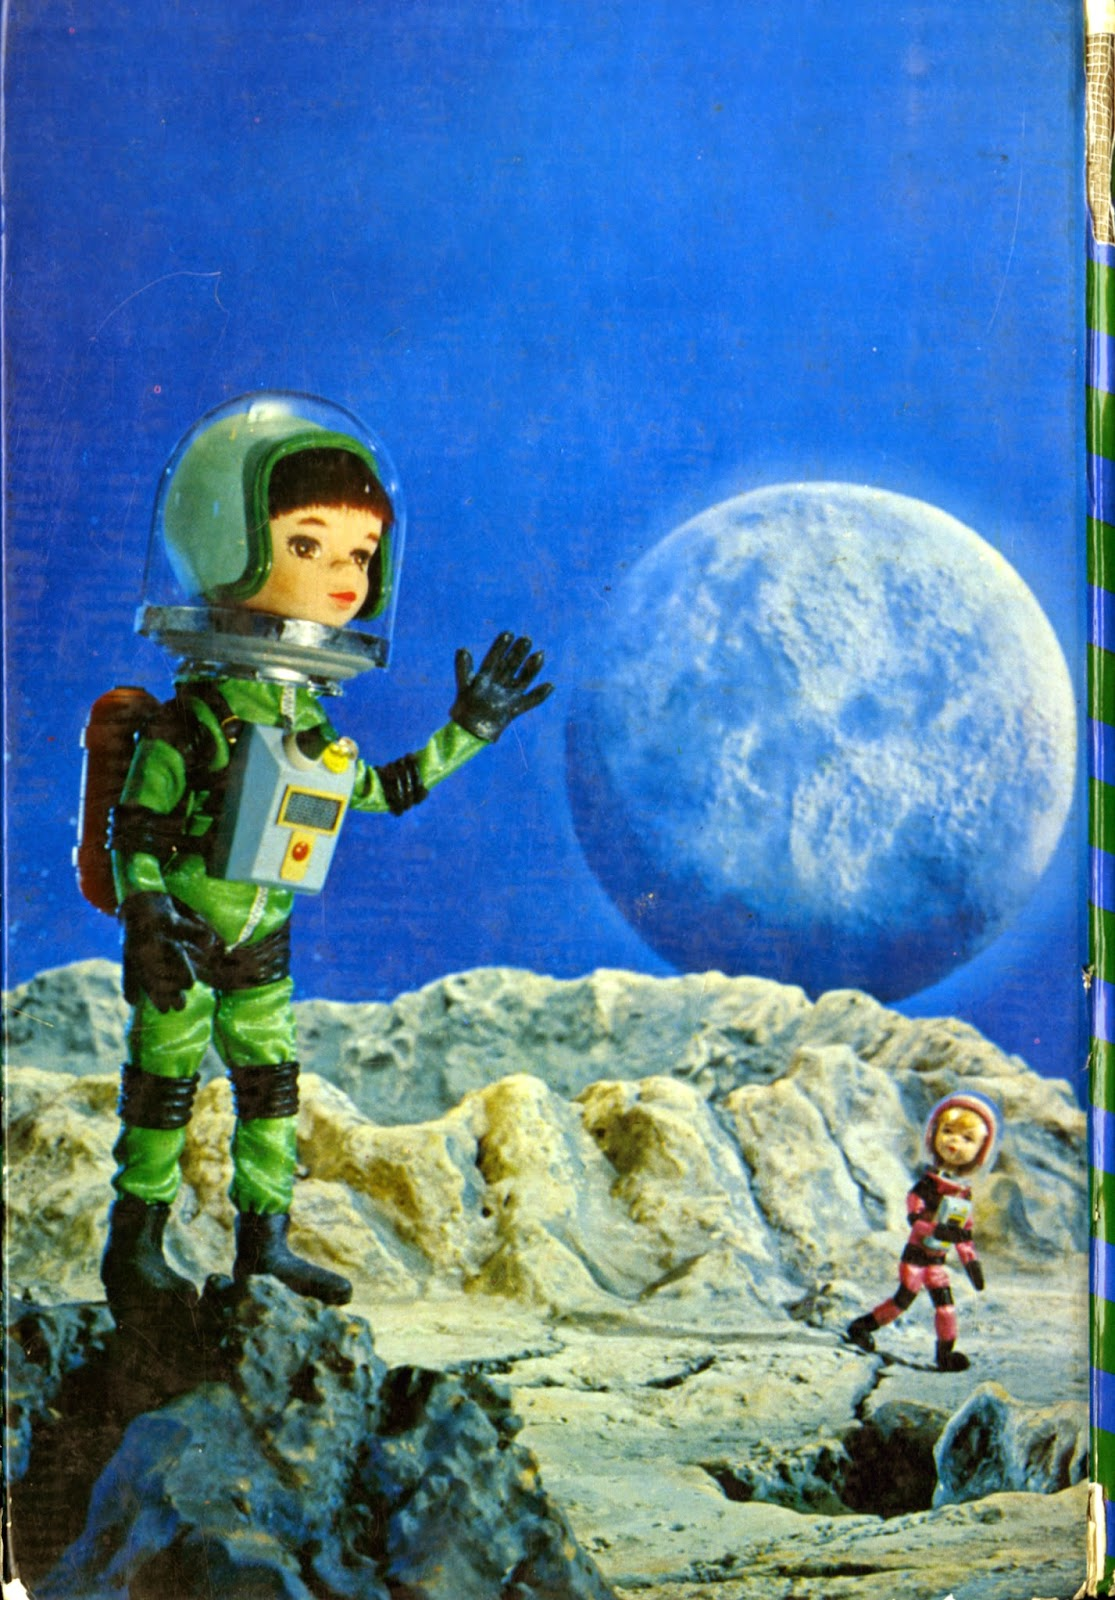 Books And Ephemera: A Rocket Trip To The